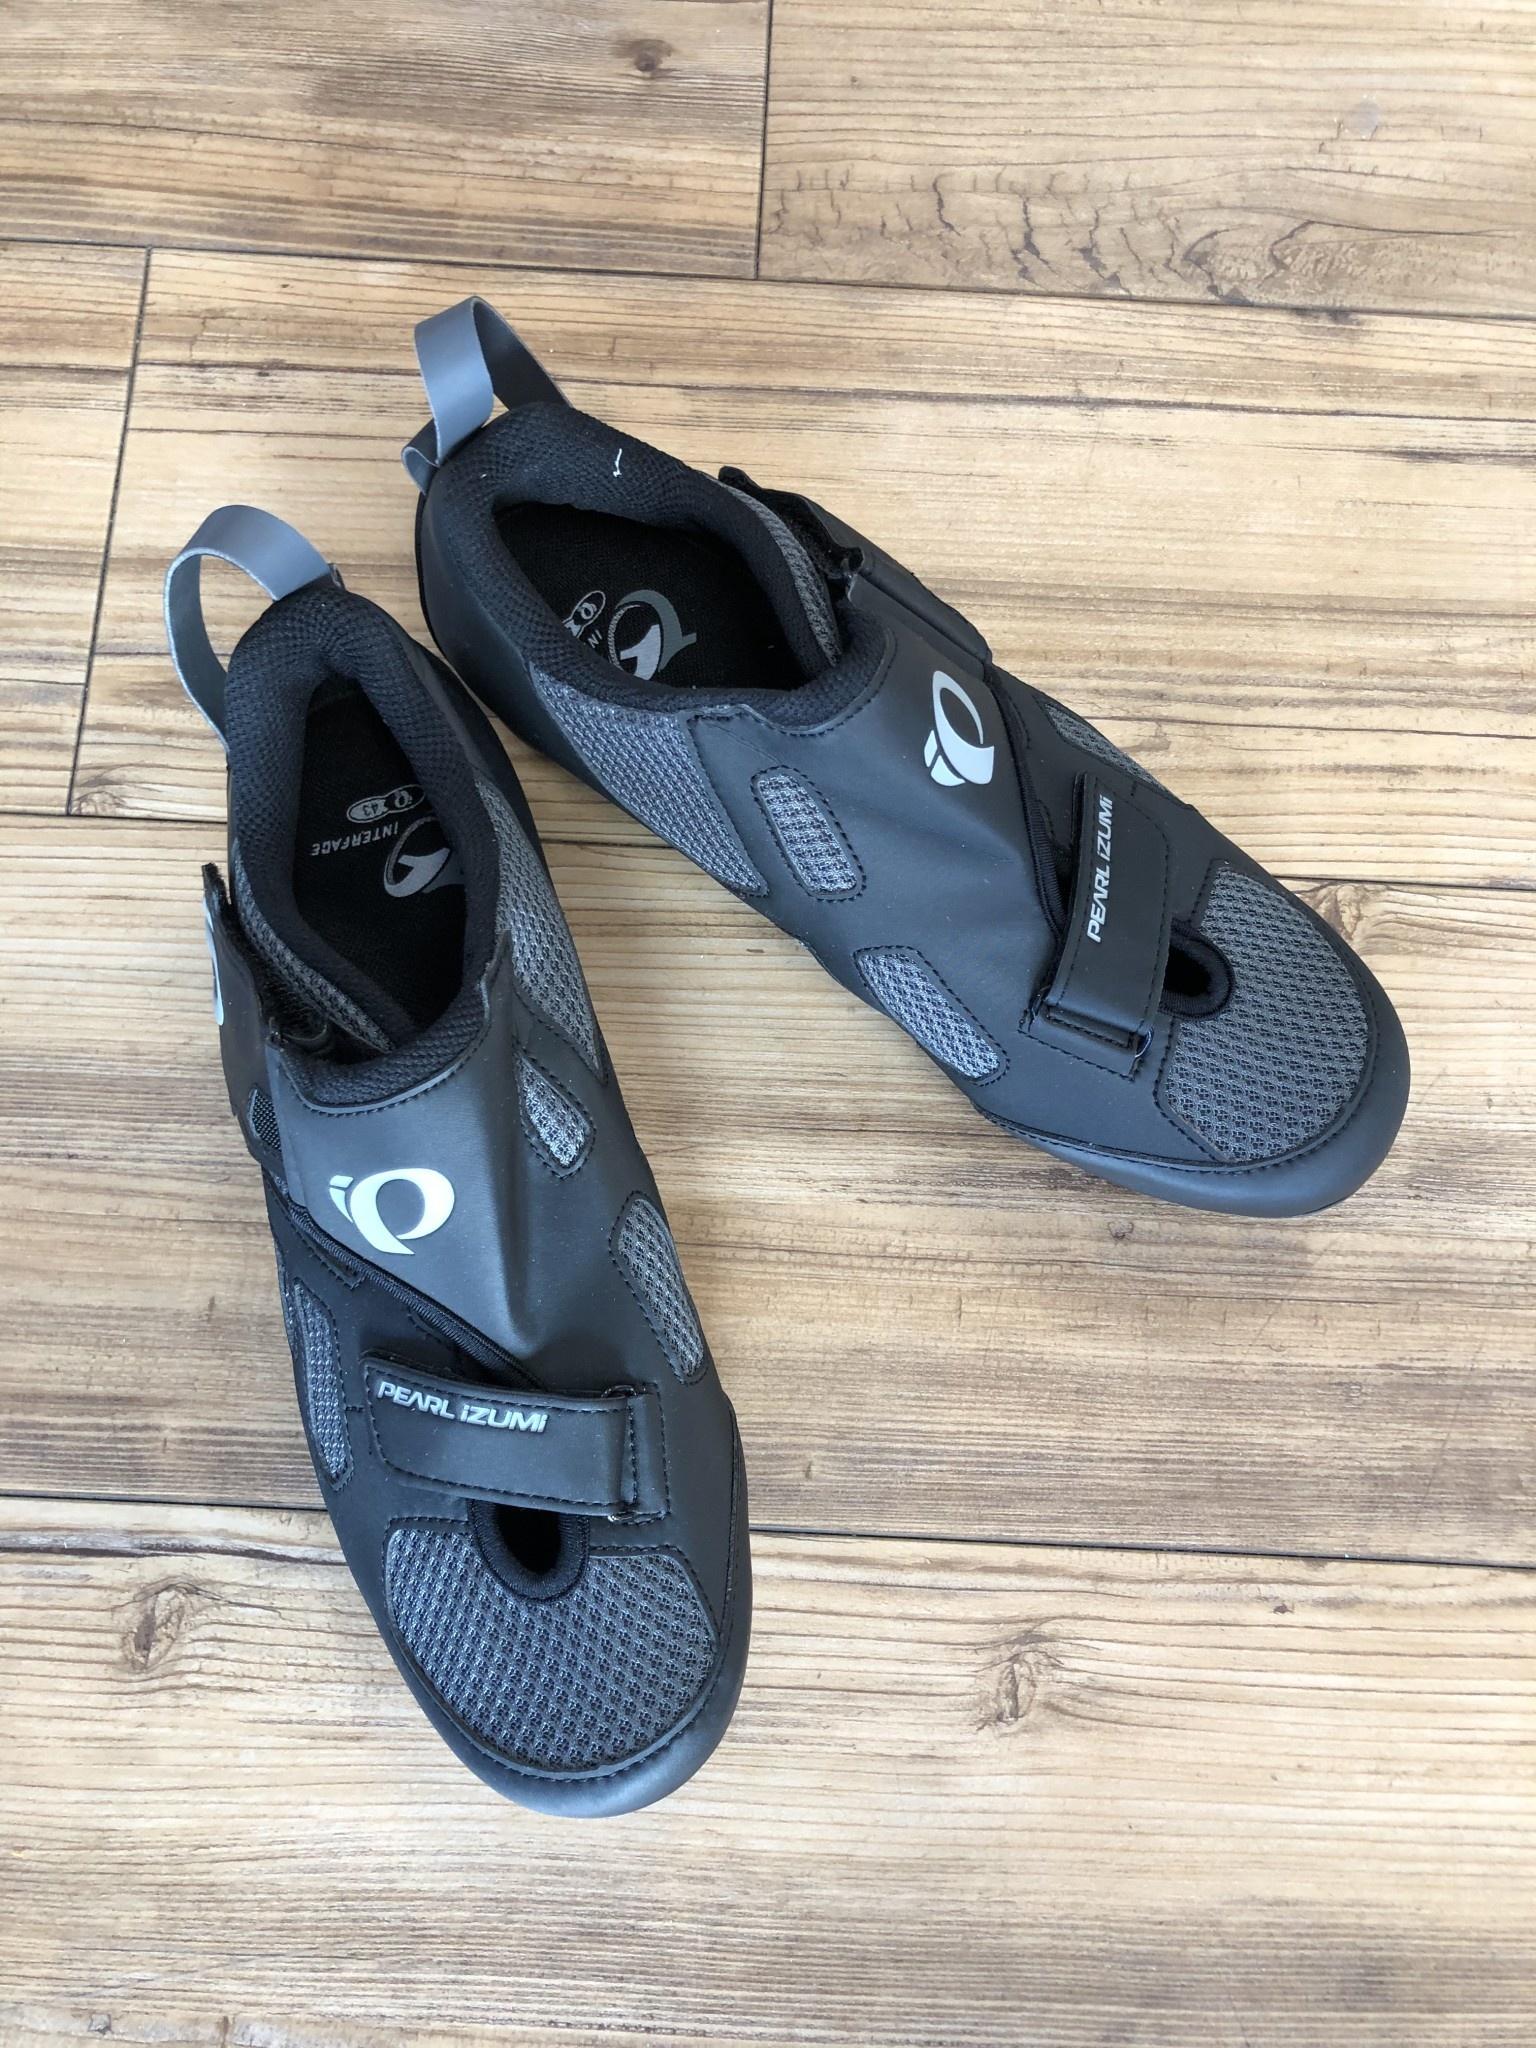 Pearl Izumi Pearl Izumi Super Cycling Shoe SALE - $100